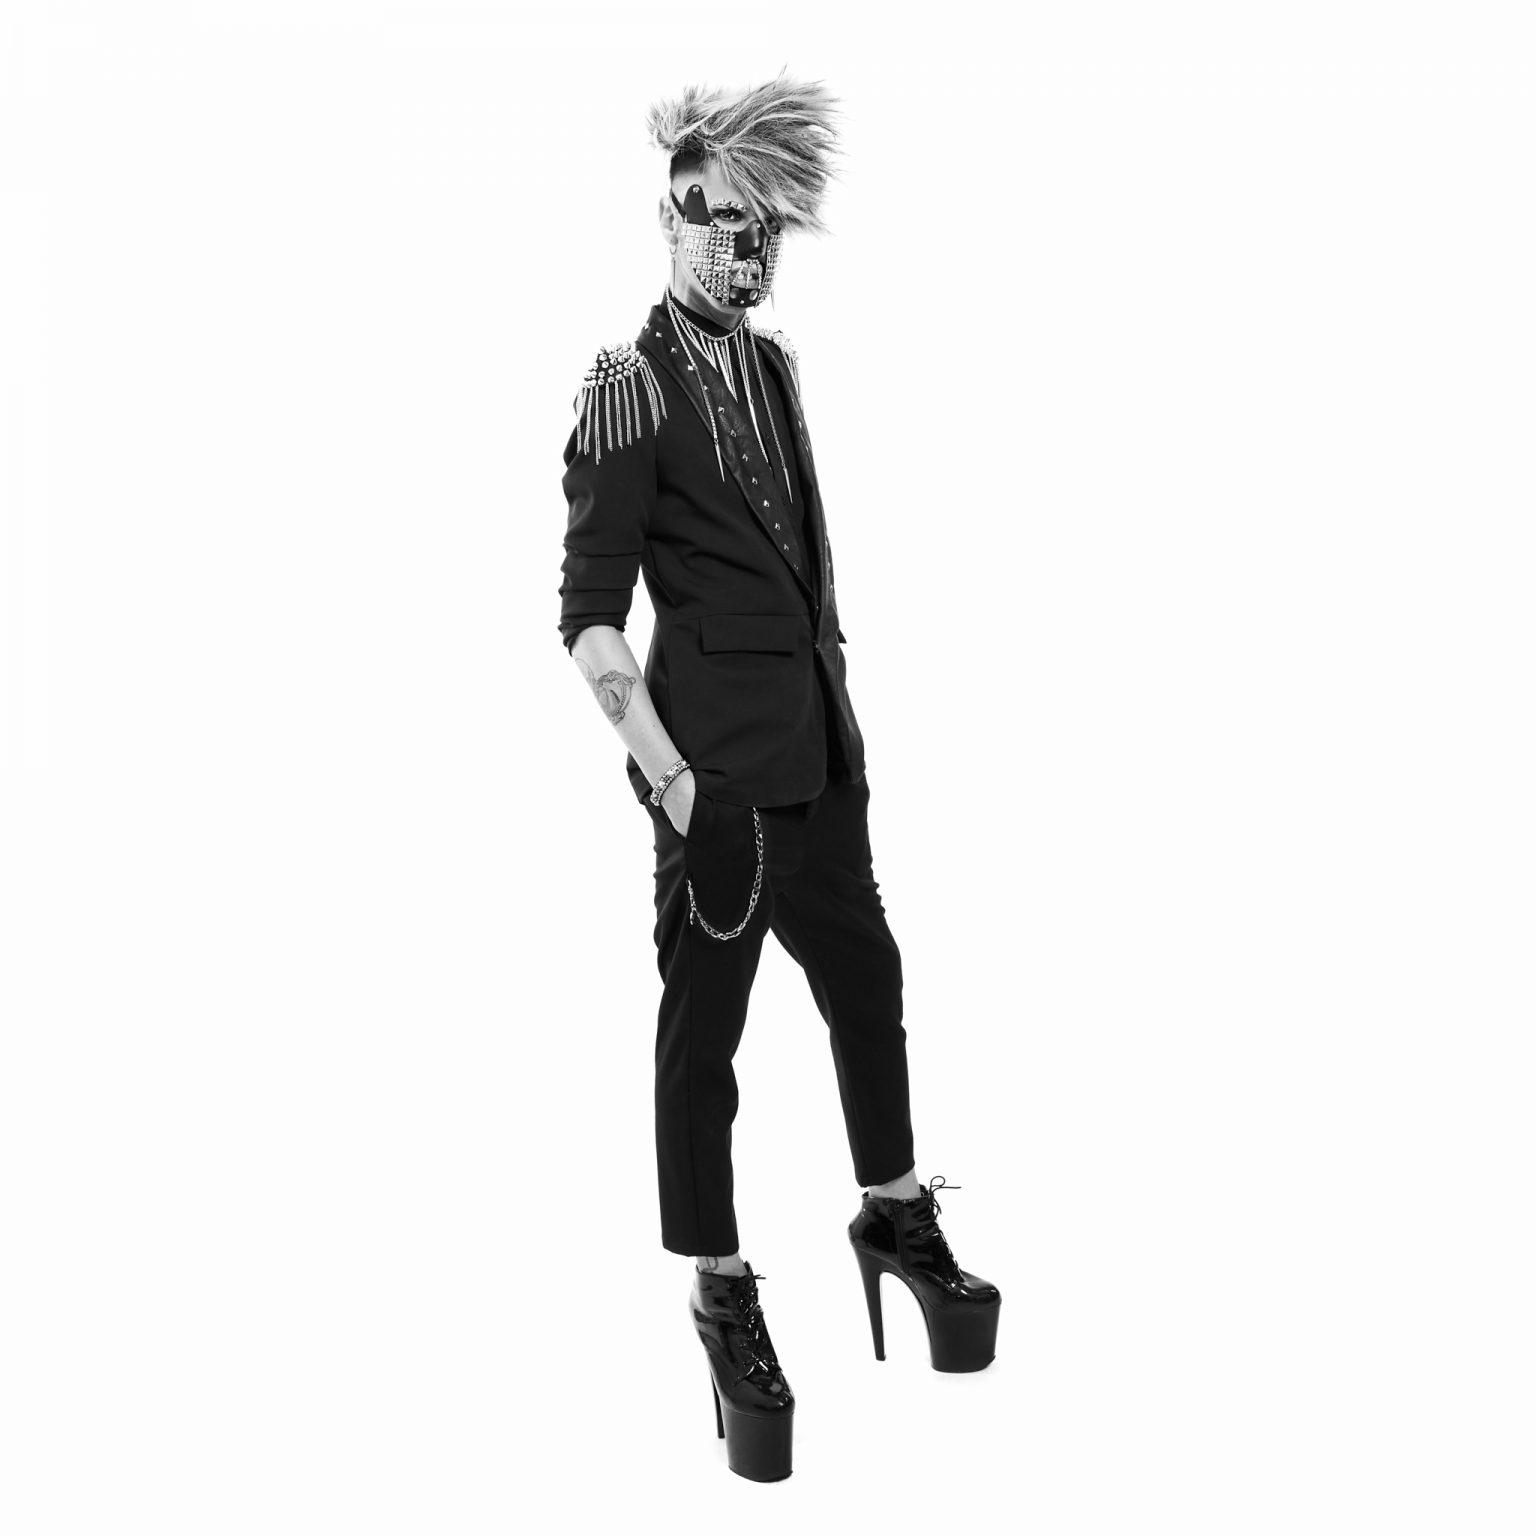 milano-2019-ricky-performer